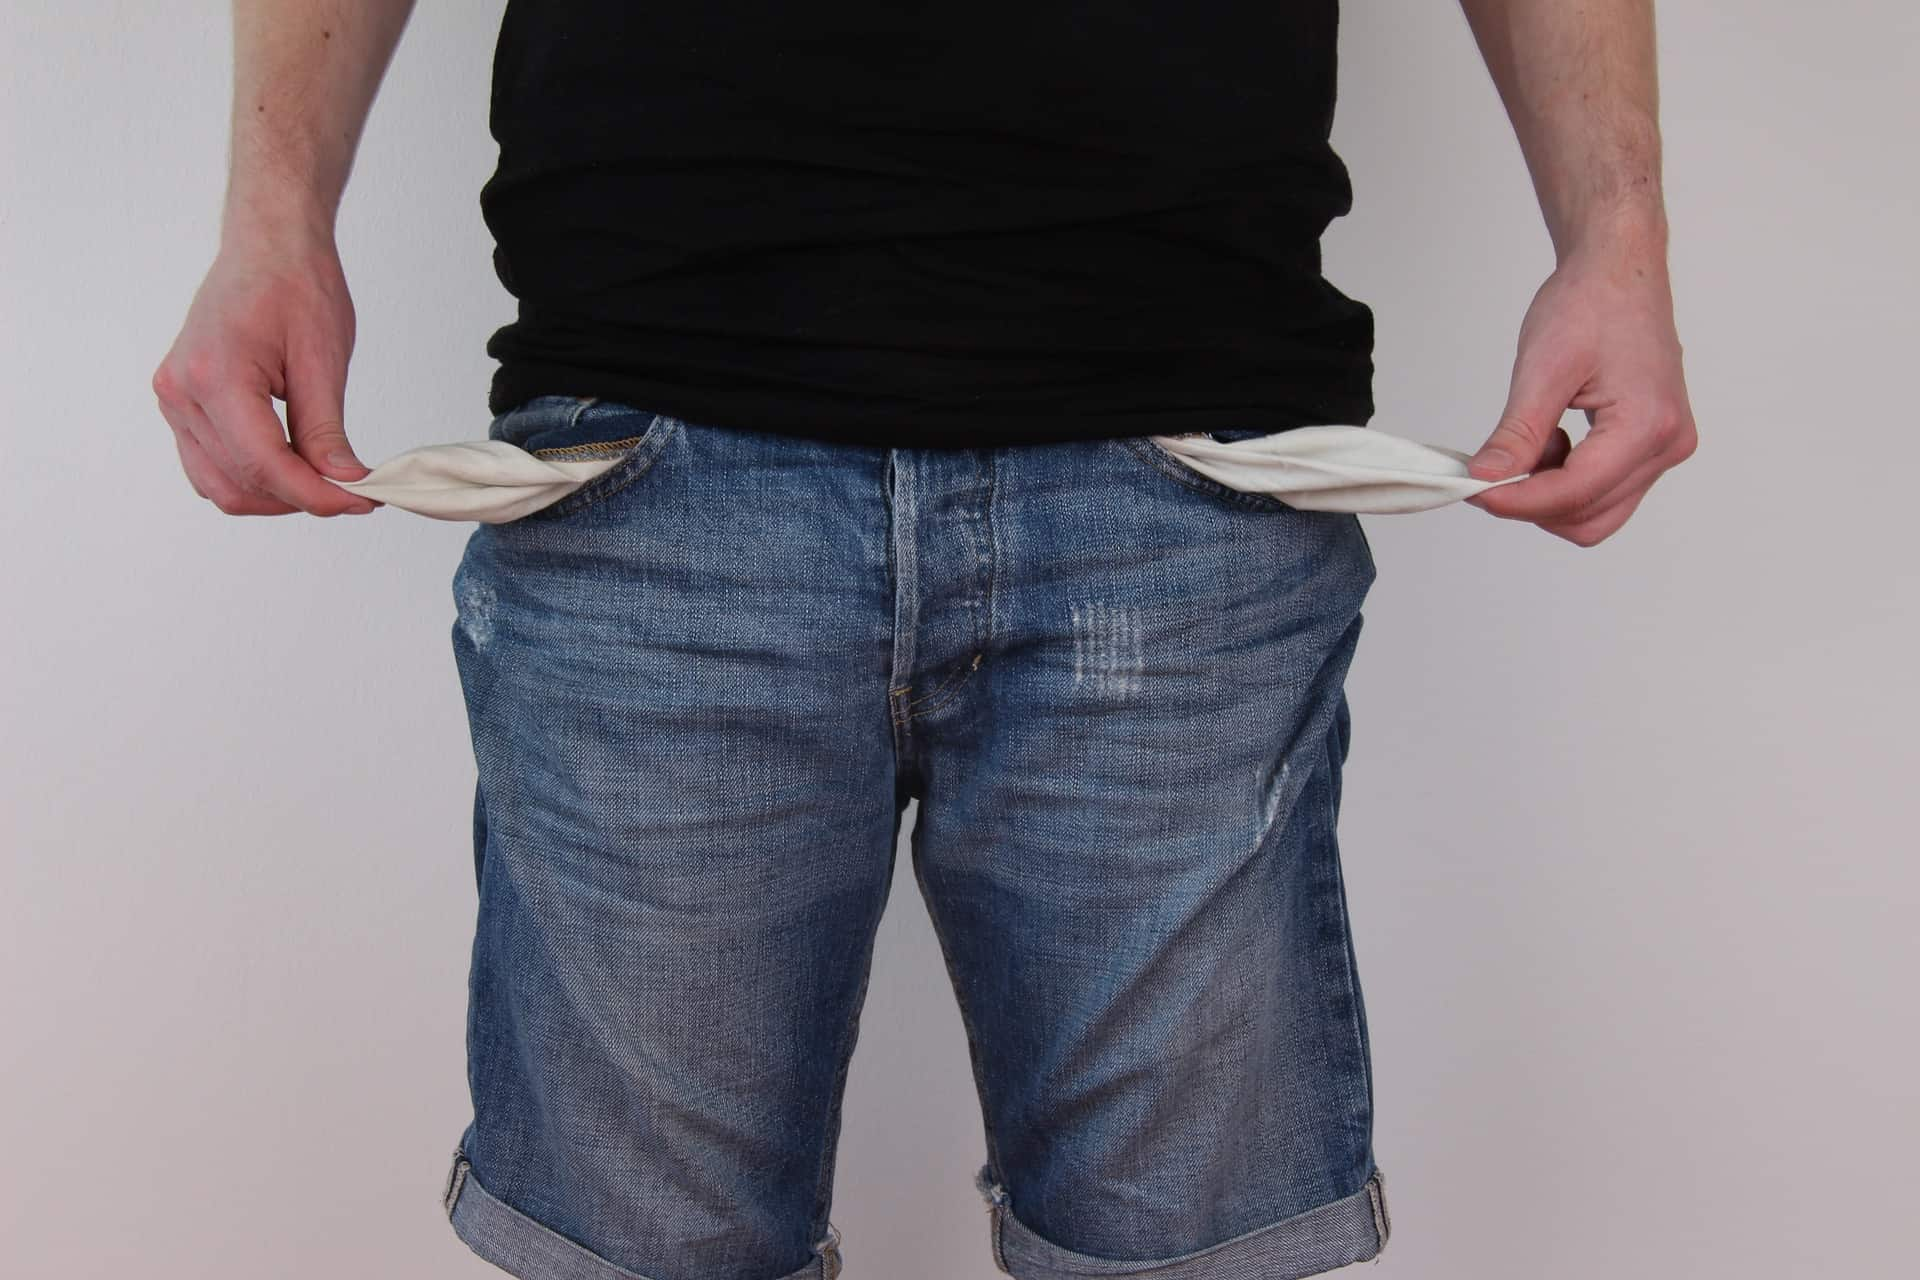 trouser pockets 1439412 1920